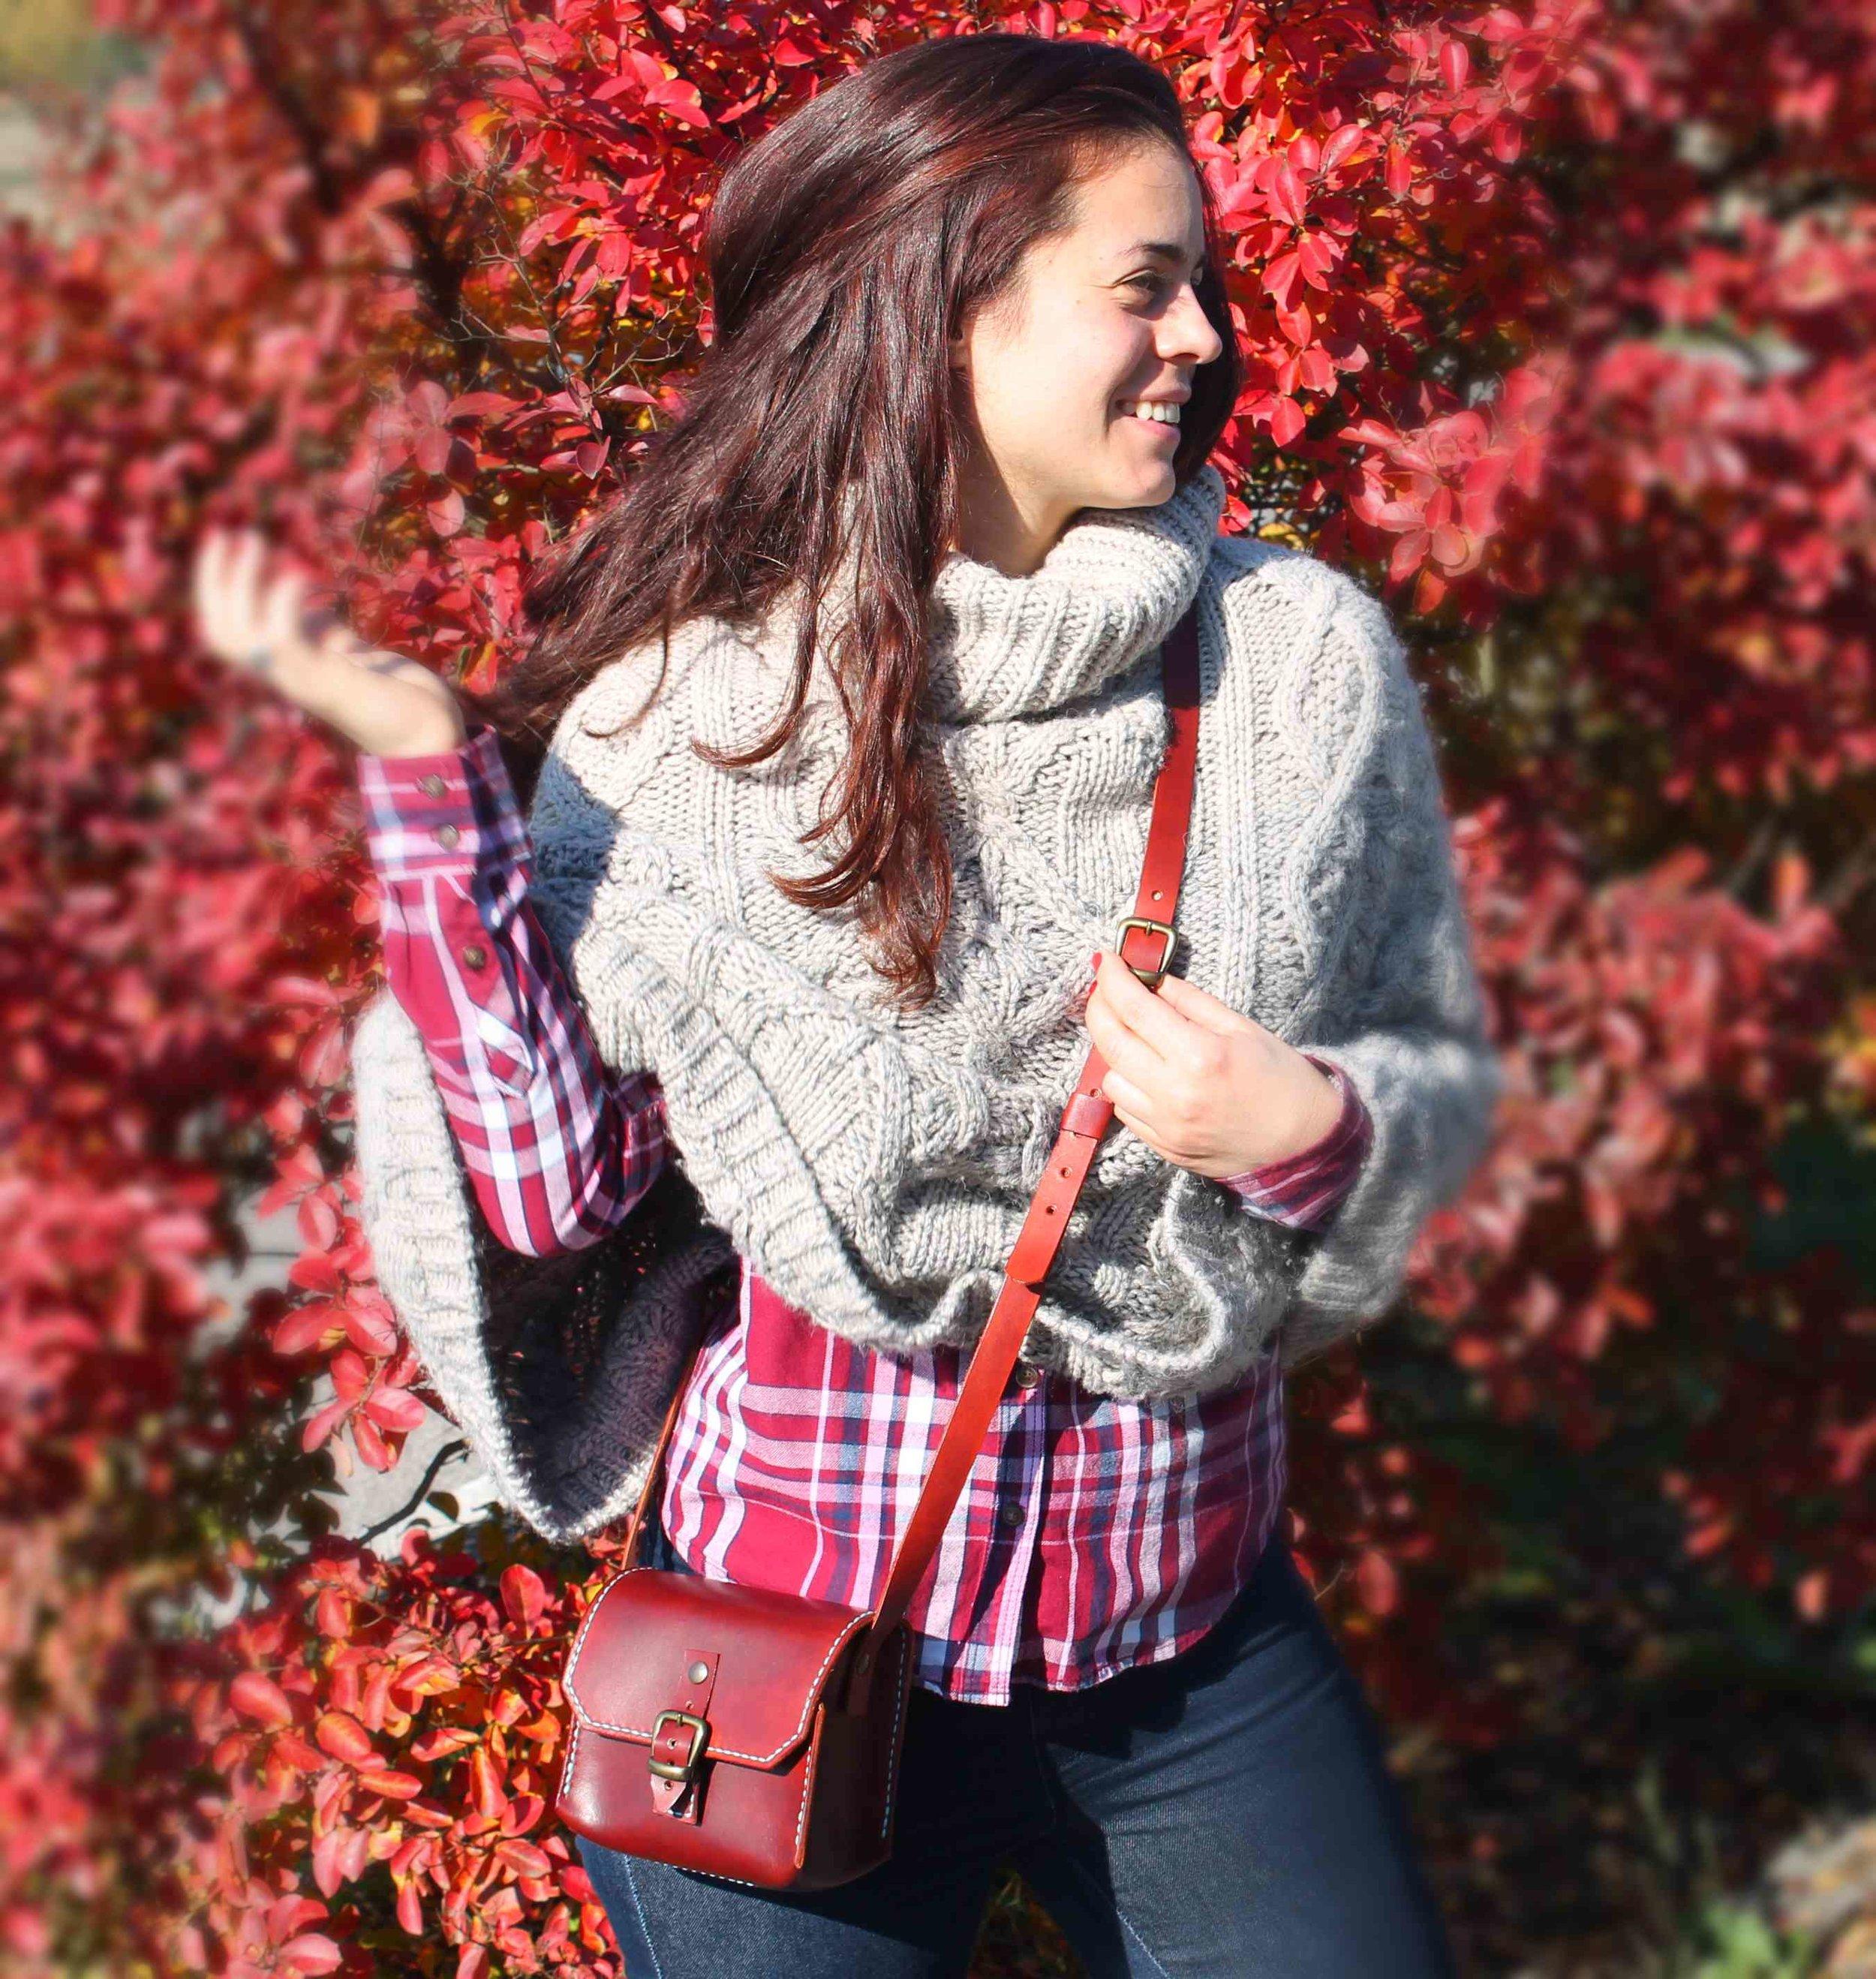 Autunno 4 #statusquoio #cuoio #bag #vigna #autumn #wave.jpg